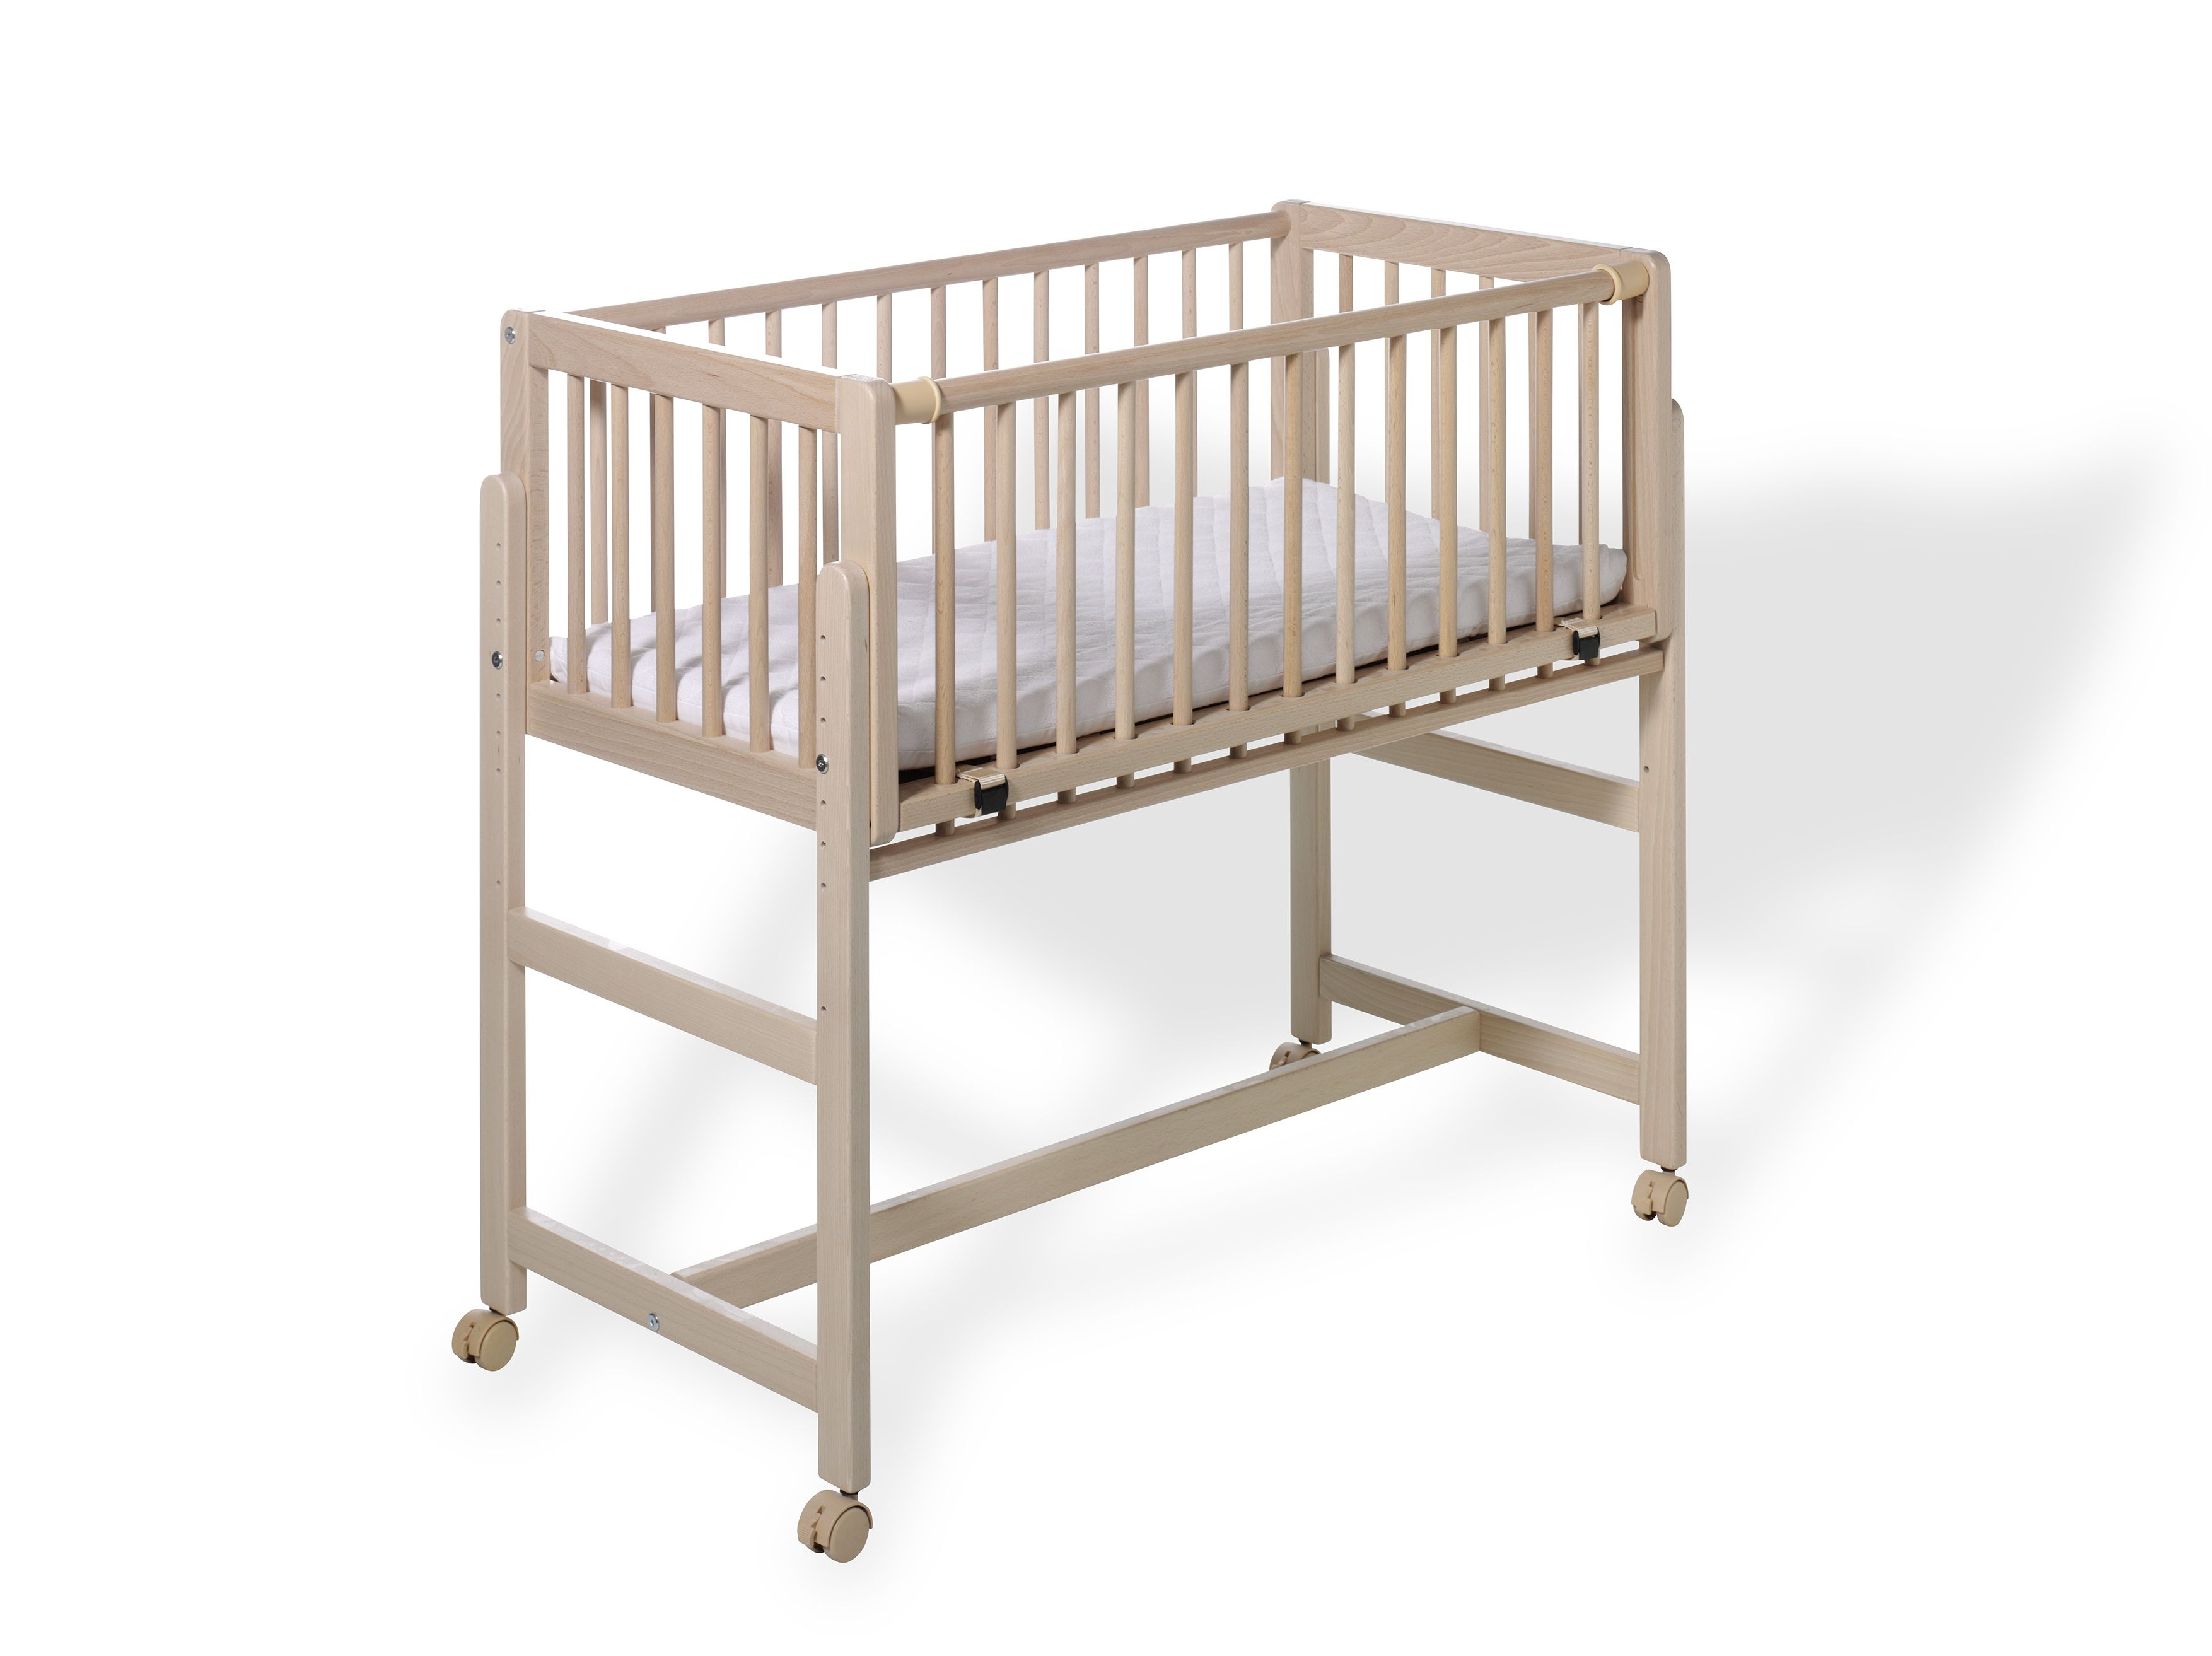 geuther bedside cot betsy for box spring beds 2017 buy. Black Bedroom Furniture Sets. Home Design Ideas